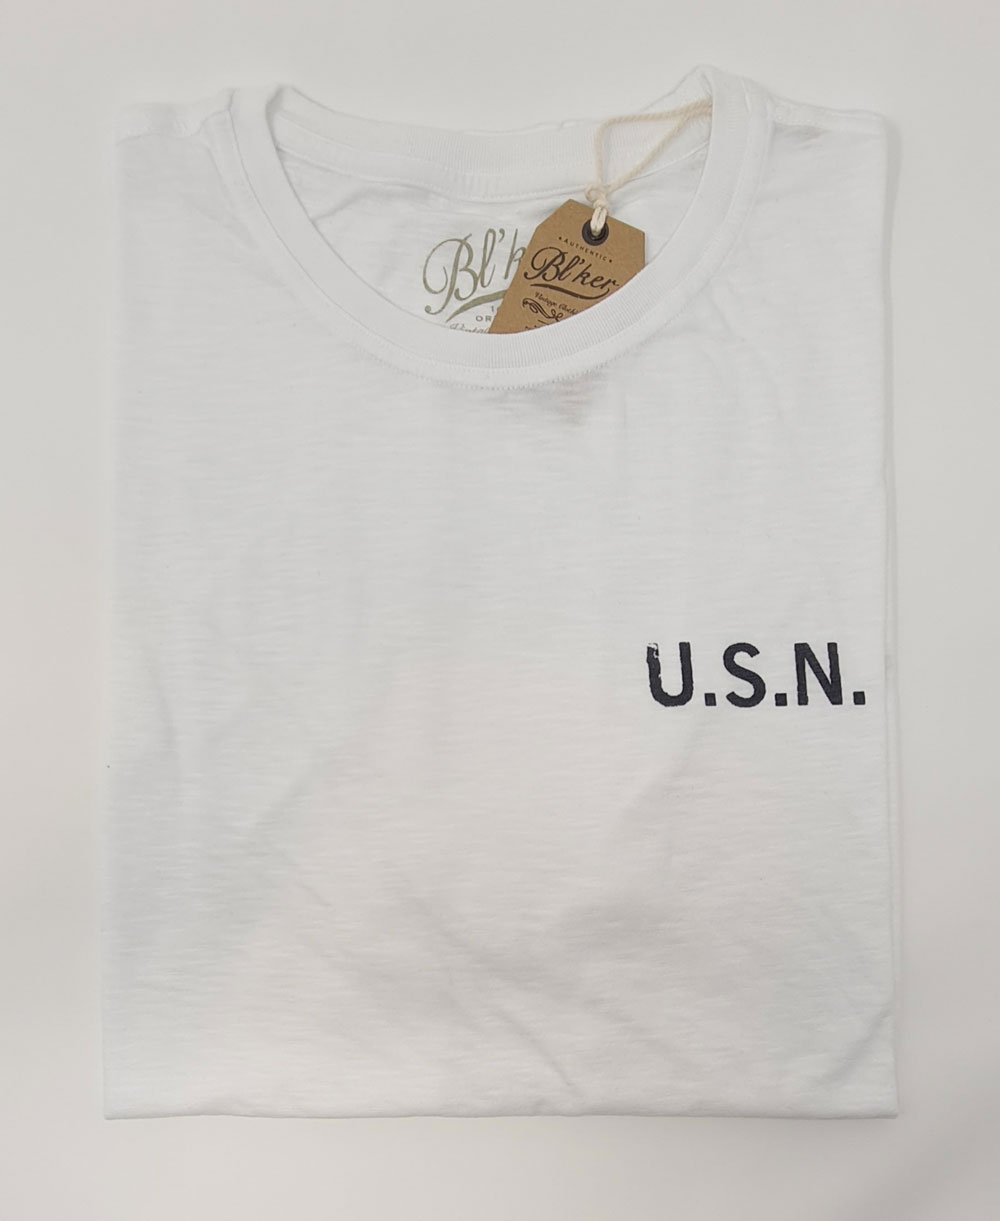 Herren Kurzarm T-Shirt USN 2021 White